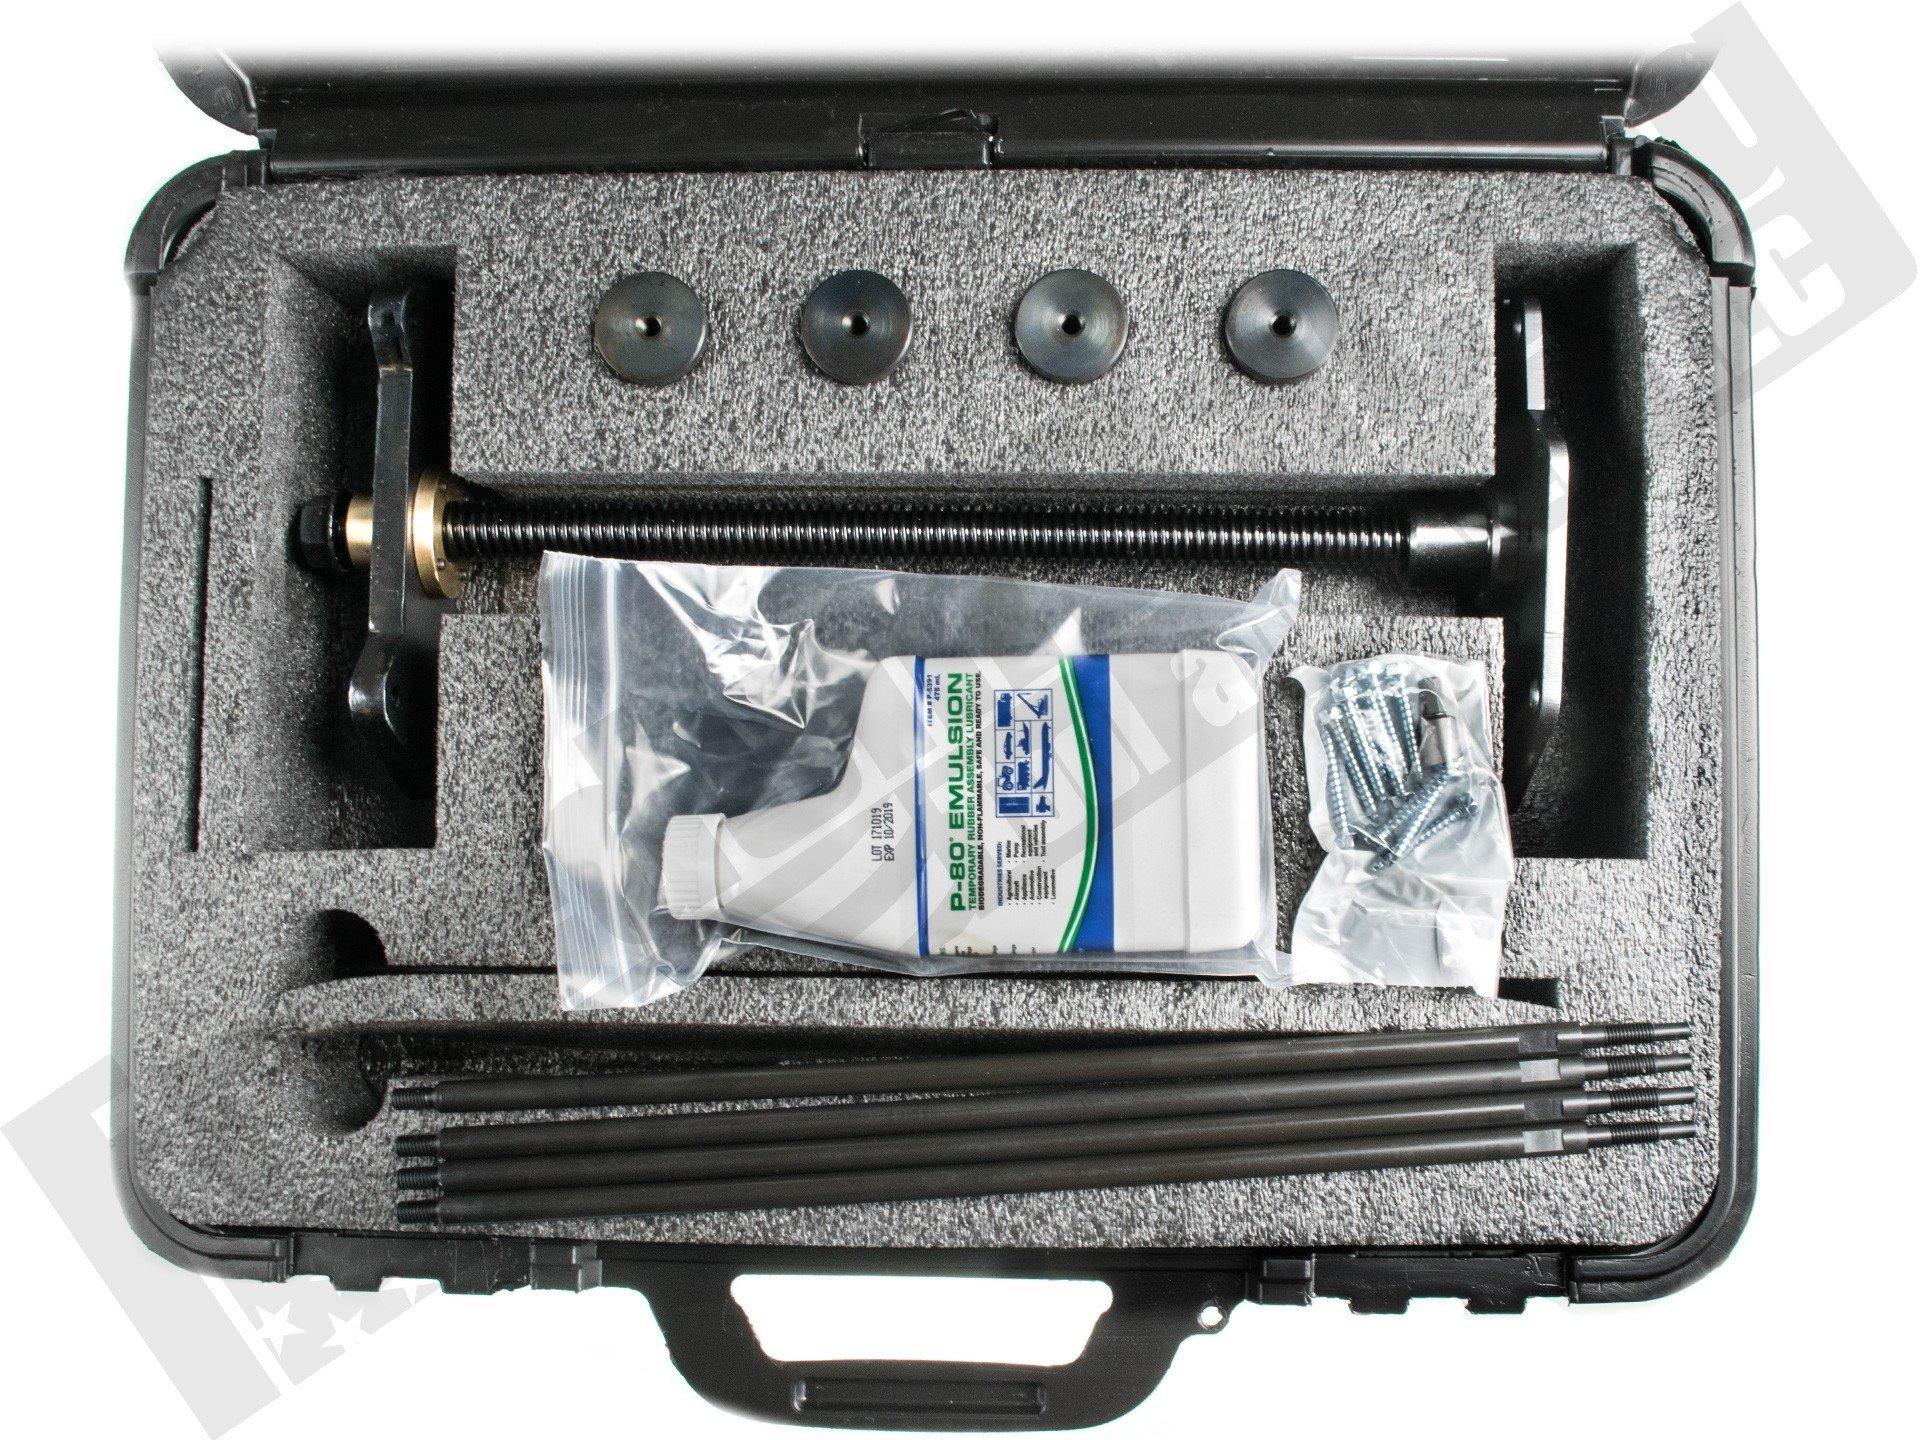 high temperature egr core puller tool